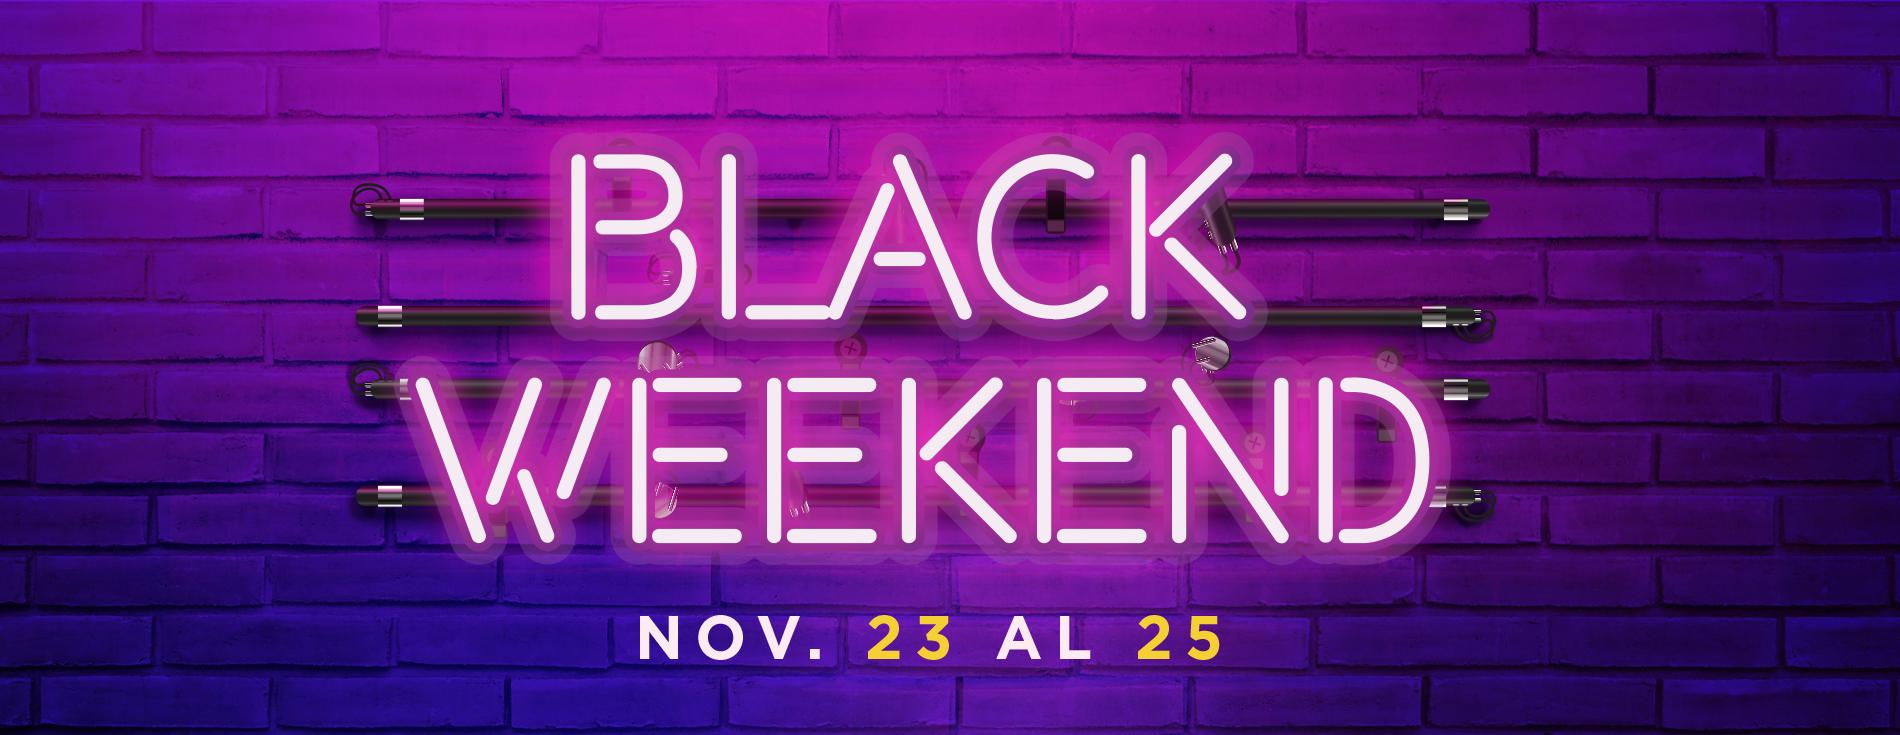 Black Weekend - Barranquilla